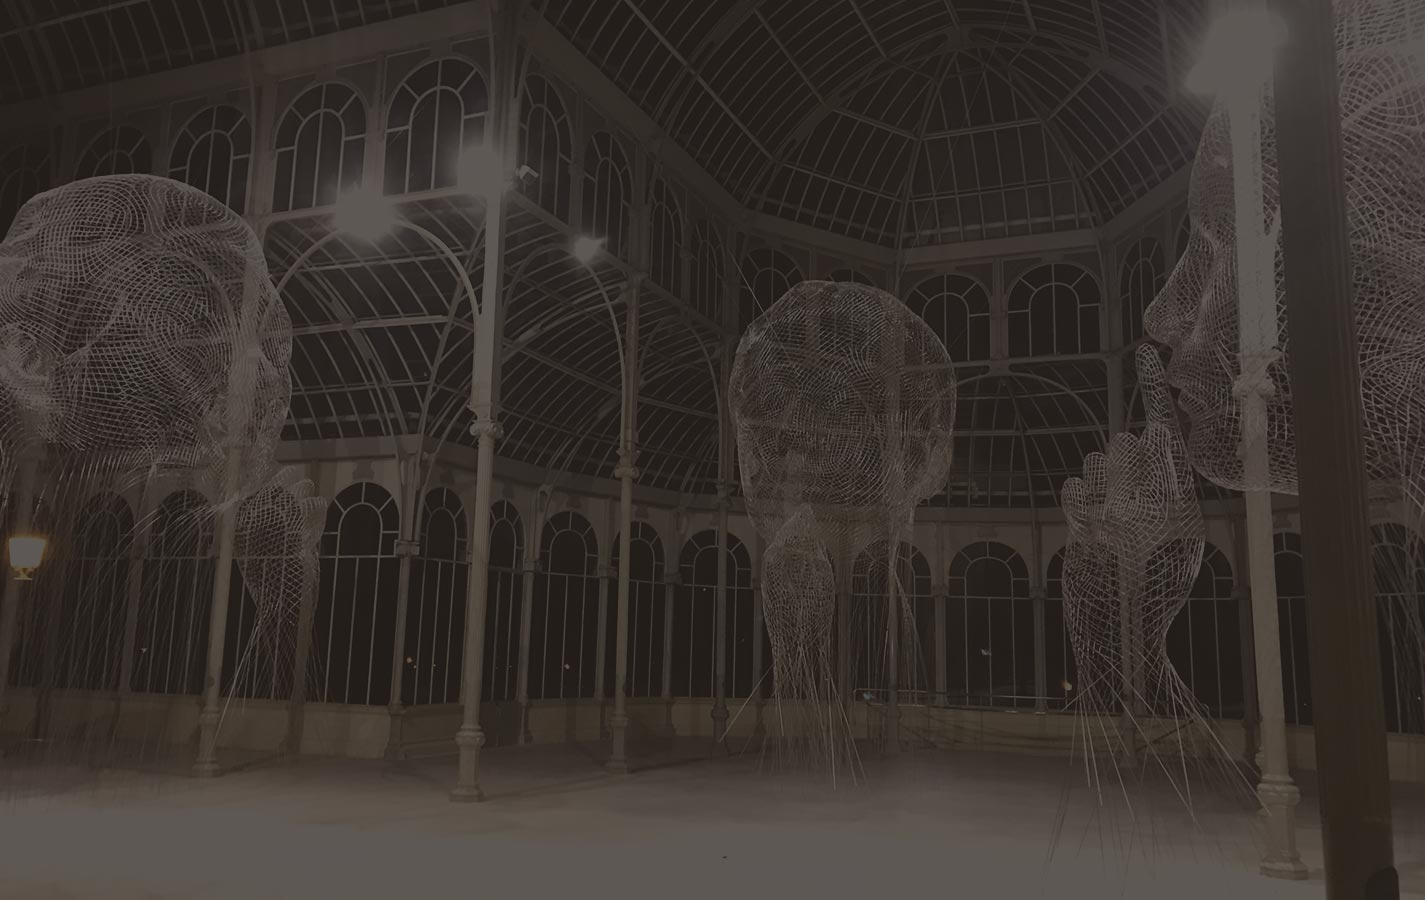 Jaume Plensa Art Exhibition Invisibles Retiro Palacio de Cristal